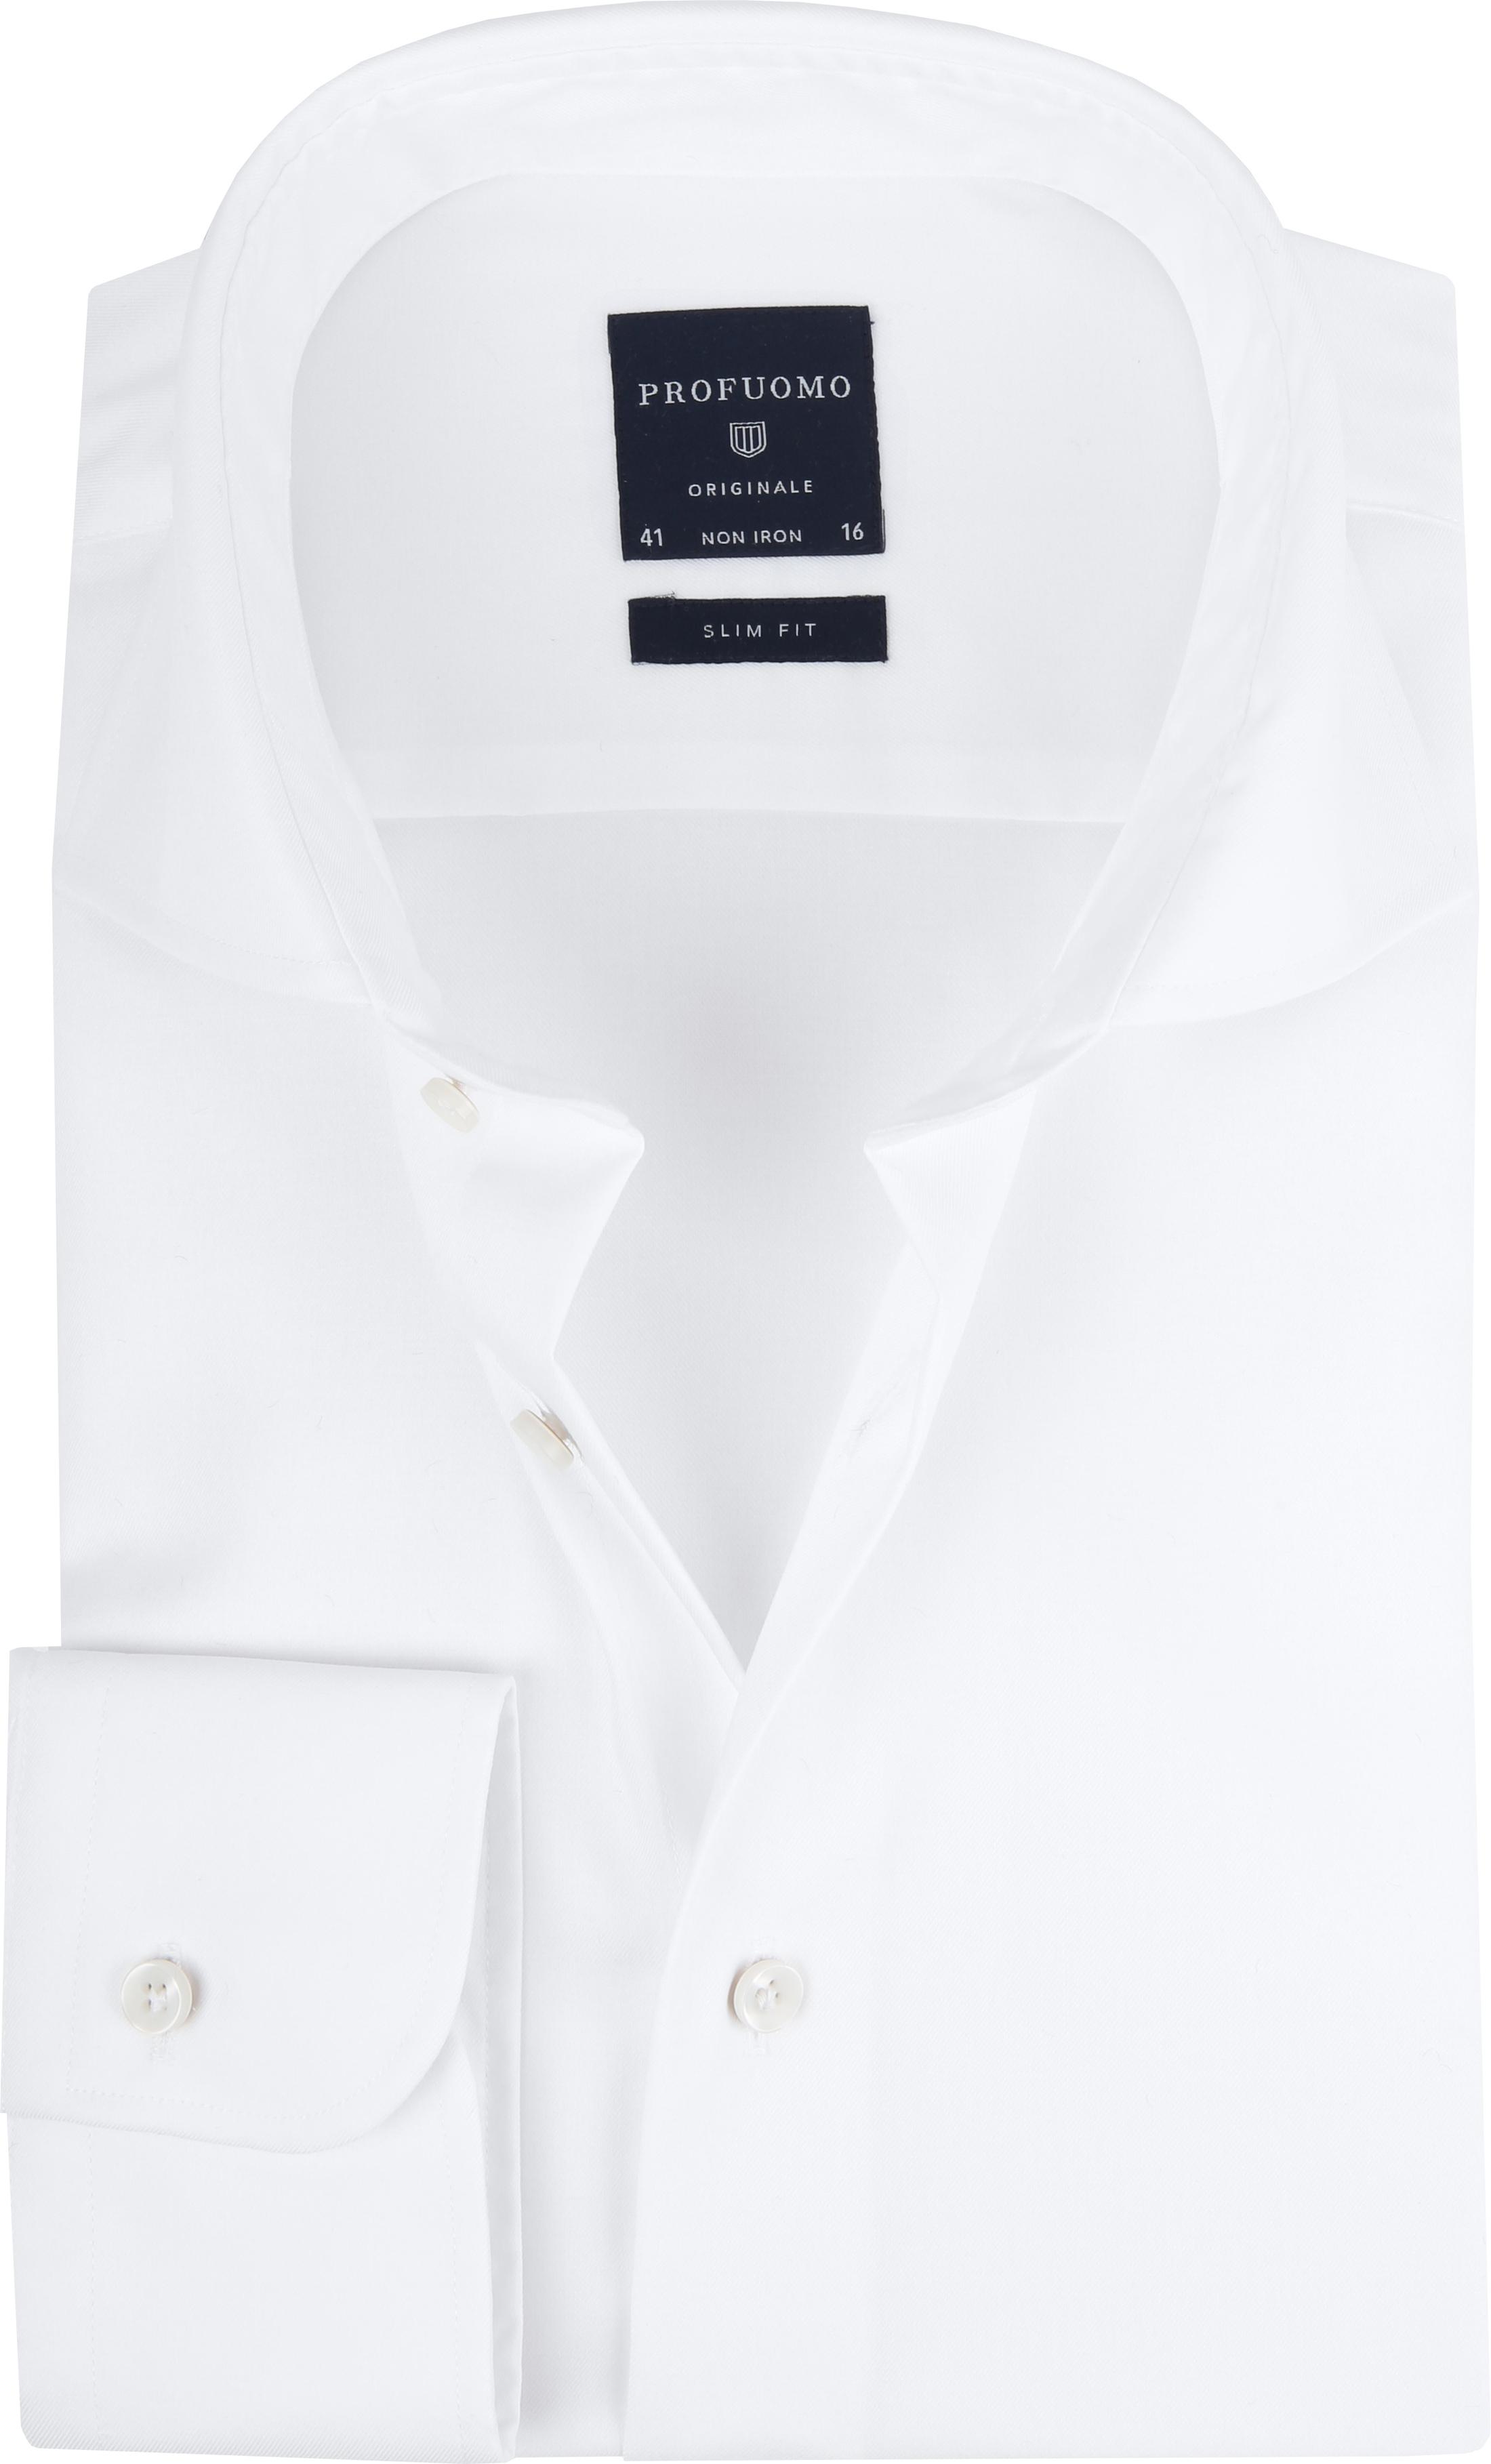 Profuomo Slim Fit Overhemd Cutaway foto 0